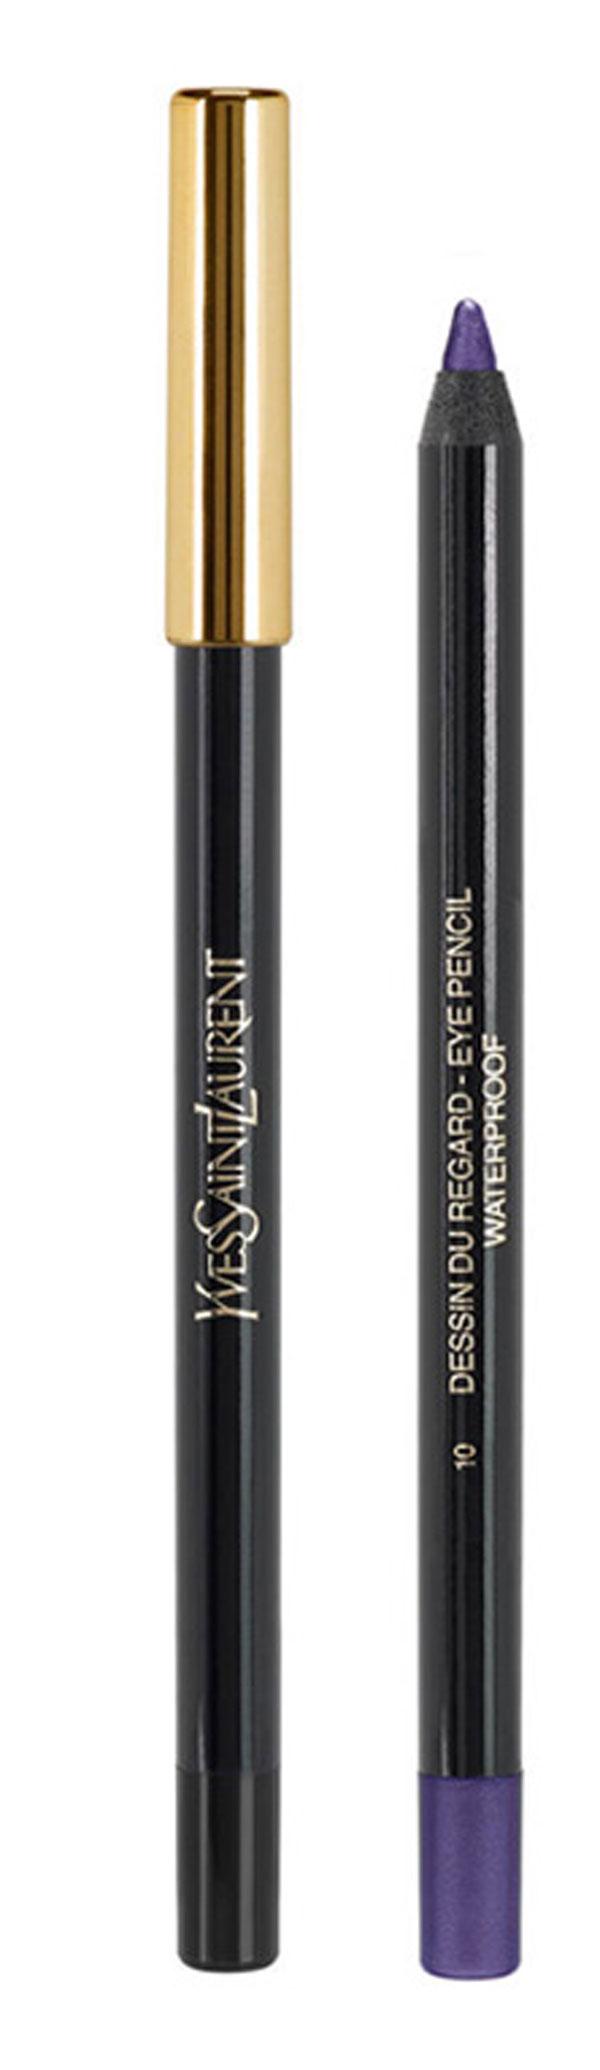 YSL-Saharienne-Heat-Makeup-